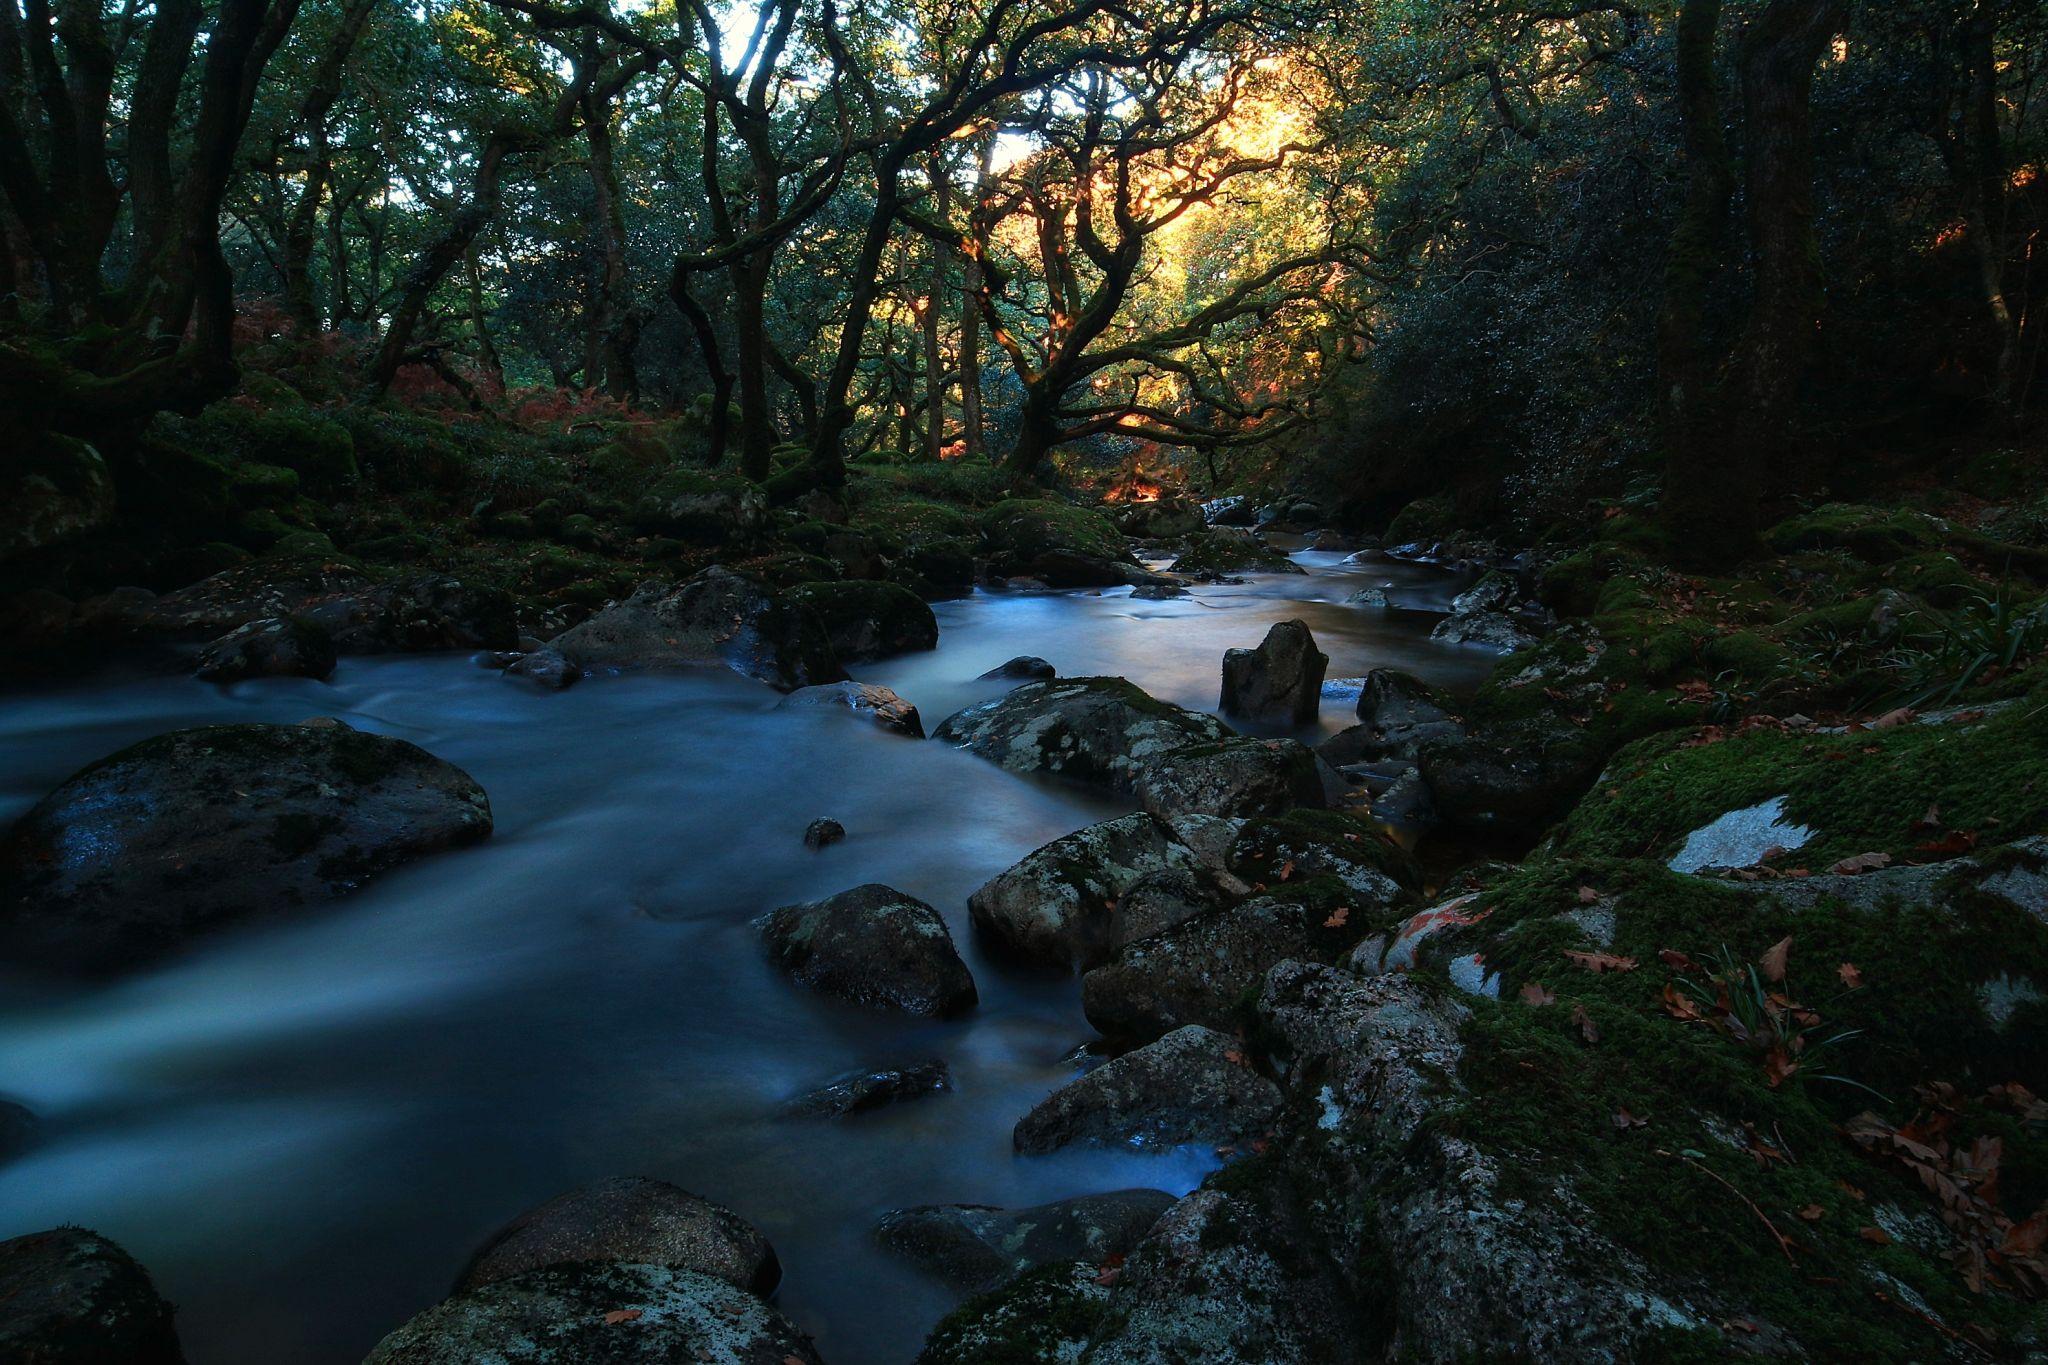 Shaugh prior river, United Kingdom